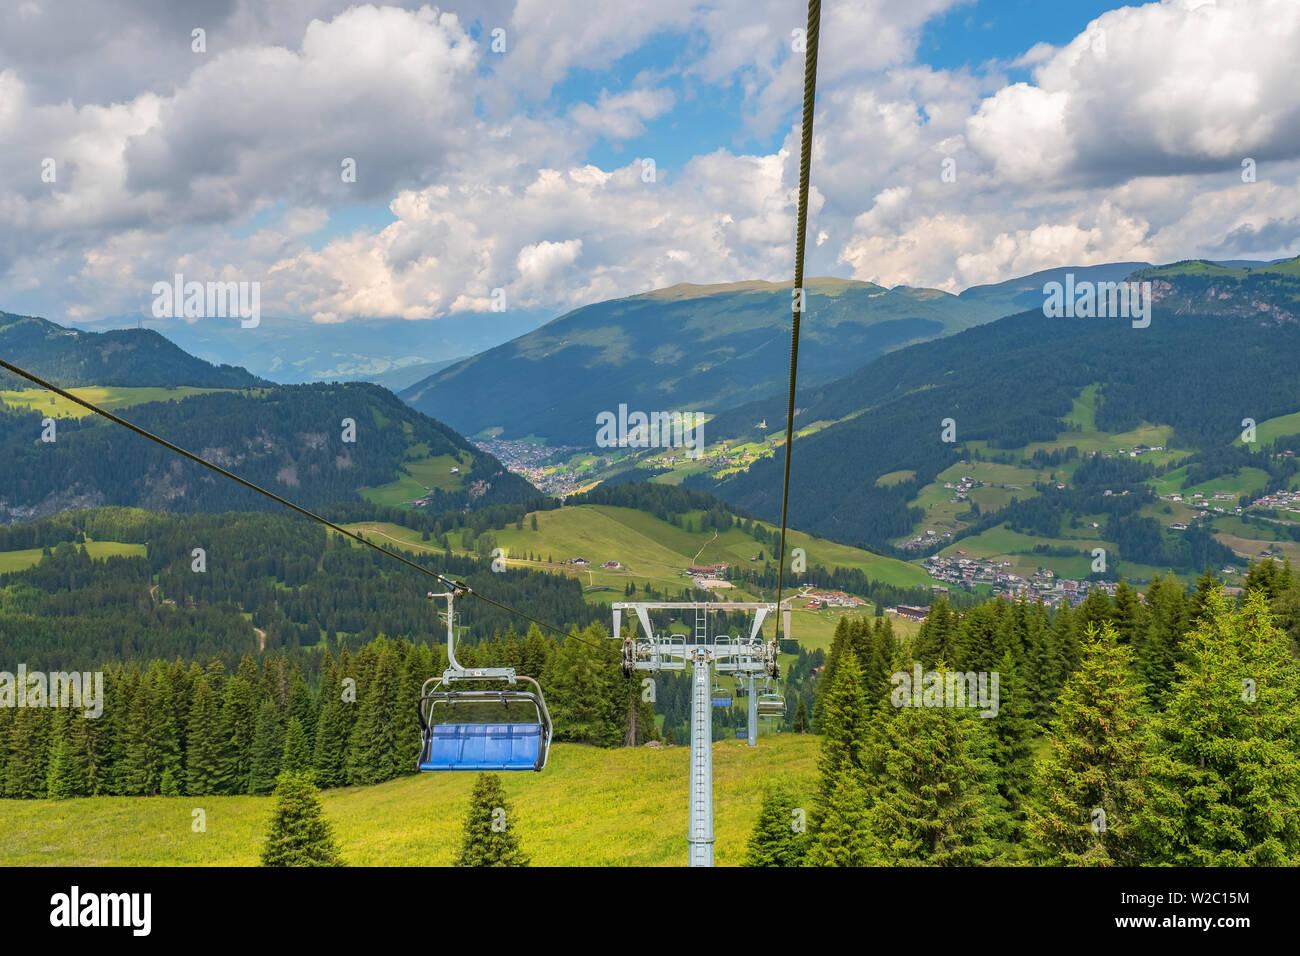 Ski lift at Val Gardena valley in Italy at summer Stock Photo